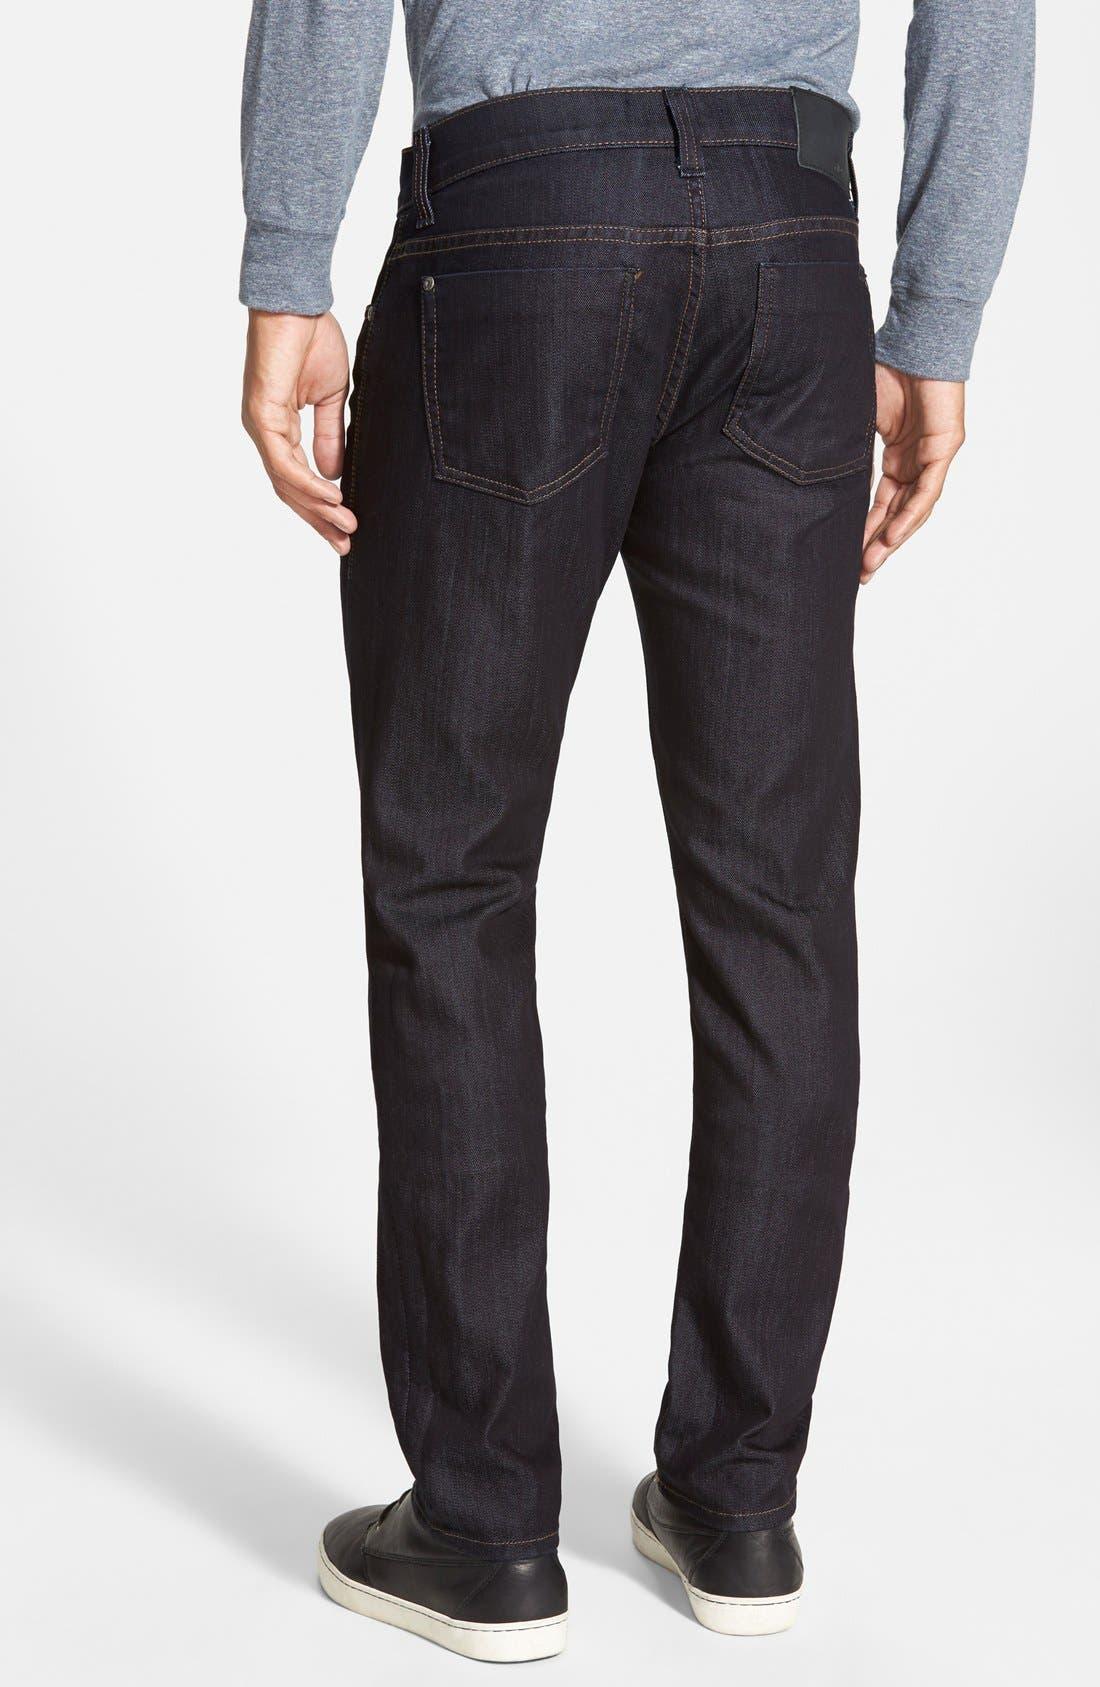 Torino Slim Fit Jeans,                             Alternate thumbnail 2, color,                             Revolution Rinse